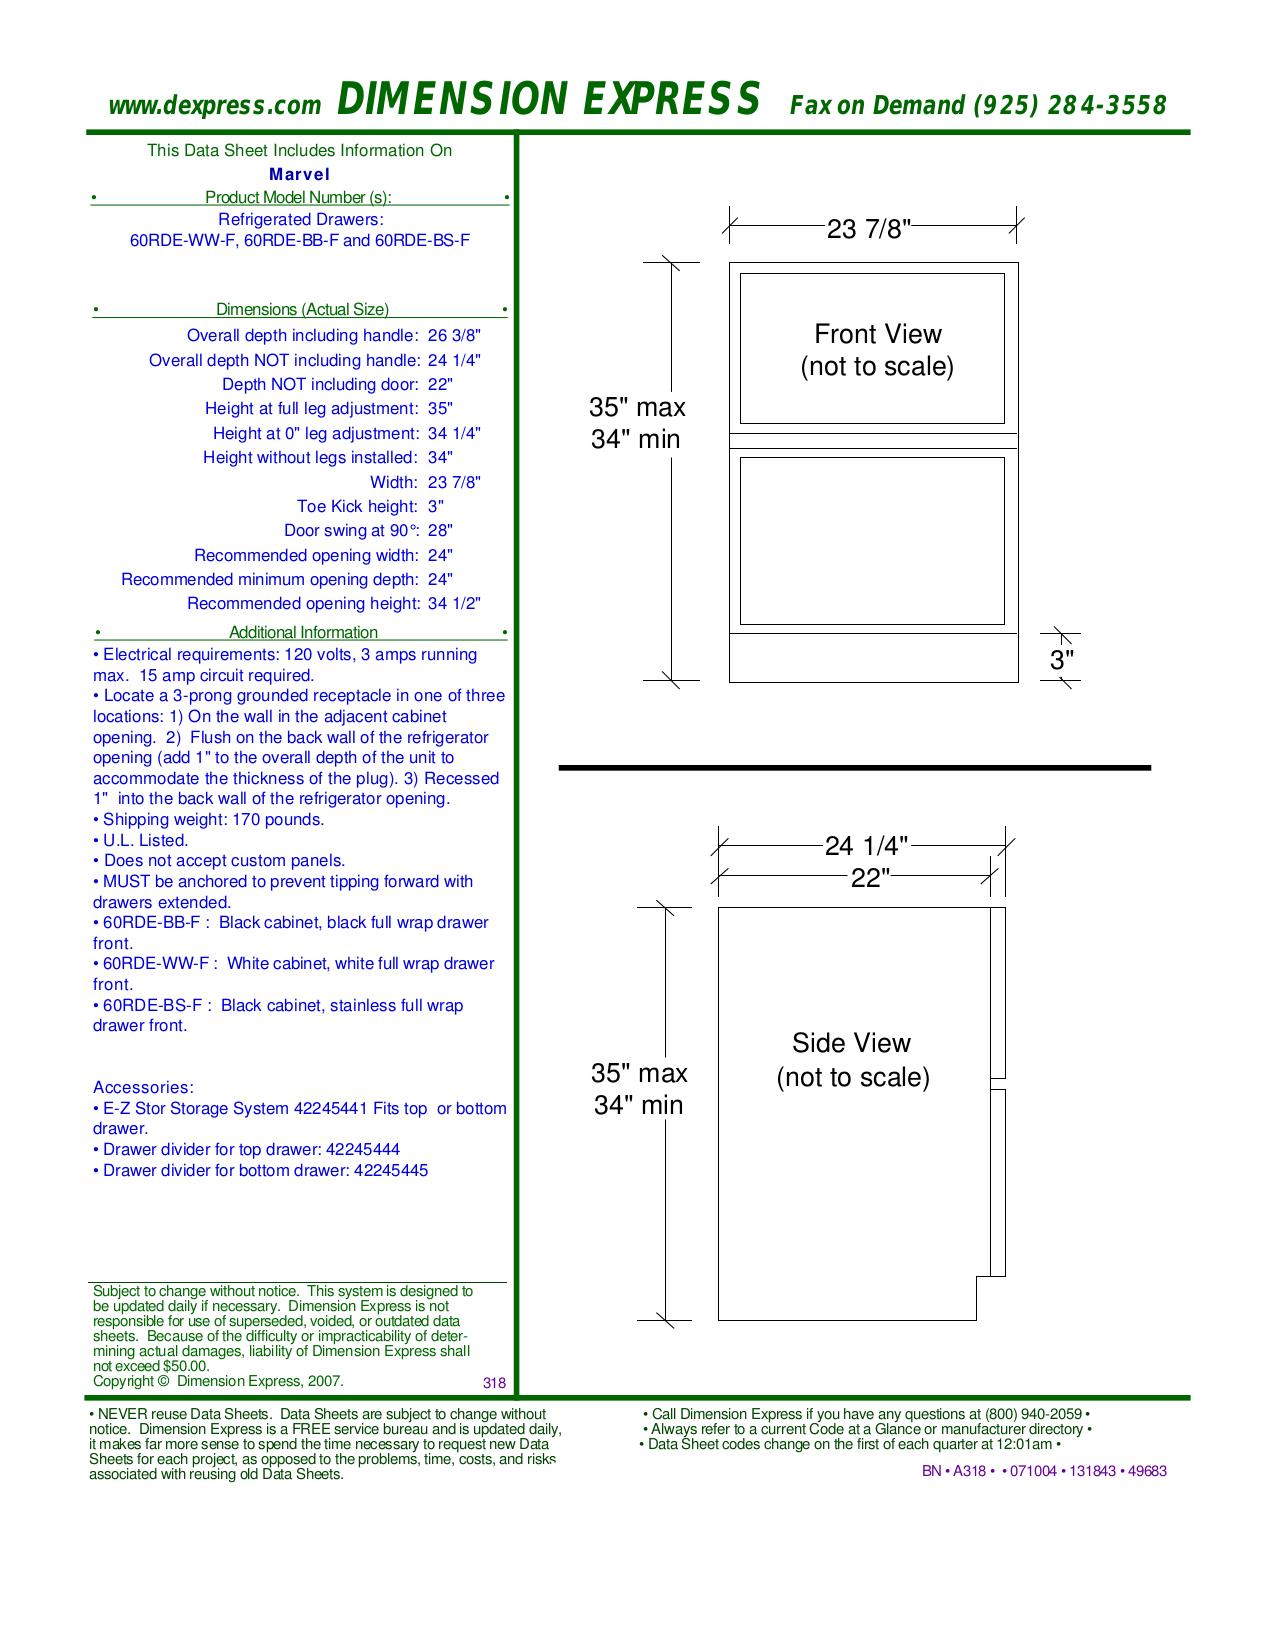 pdf for Marvel Refrigerator 60RDE-BB-F manual